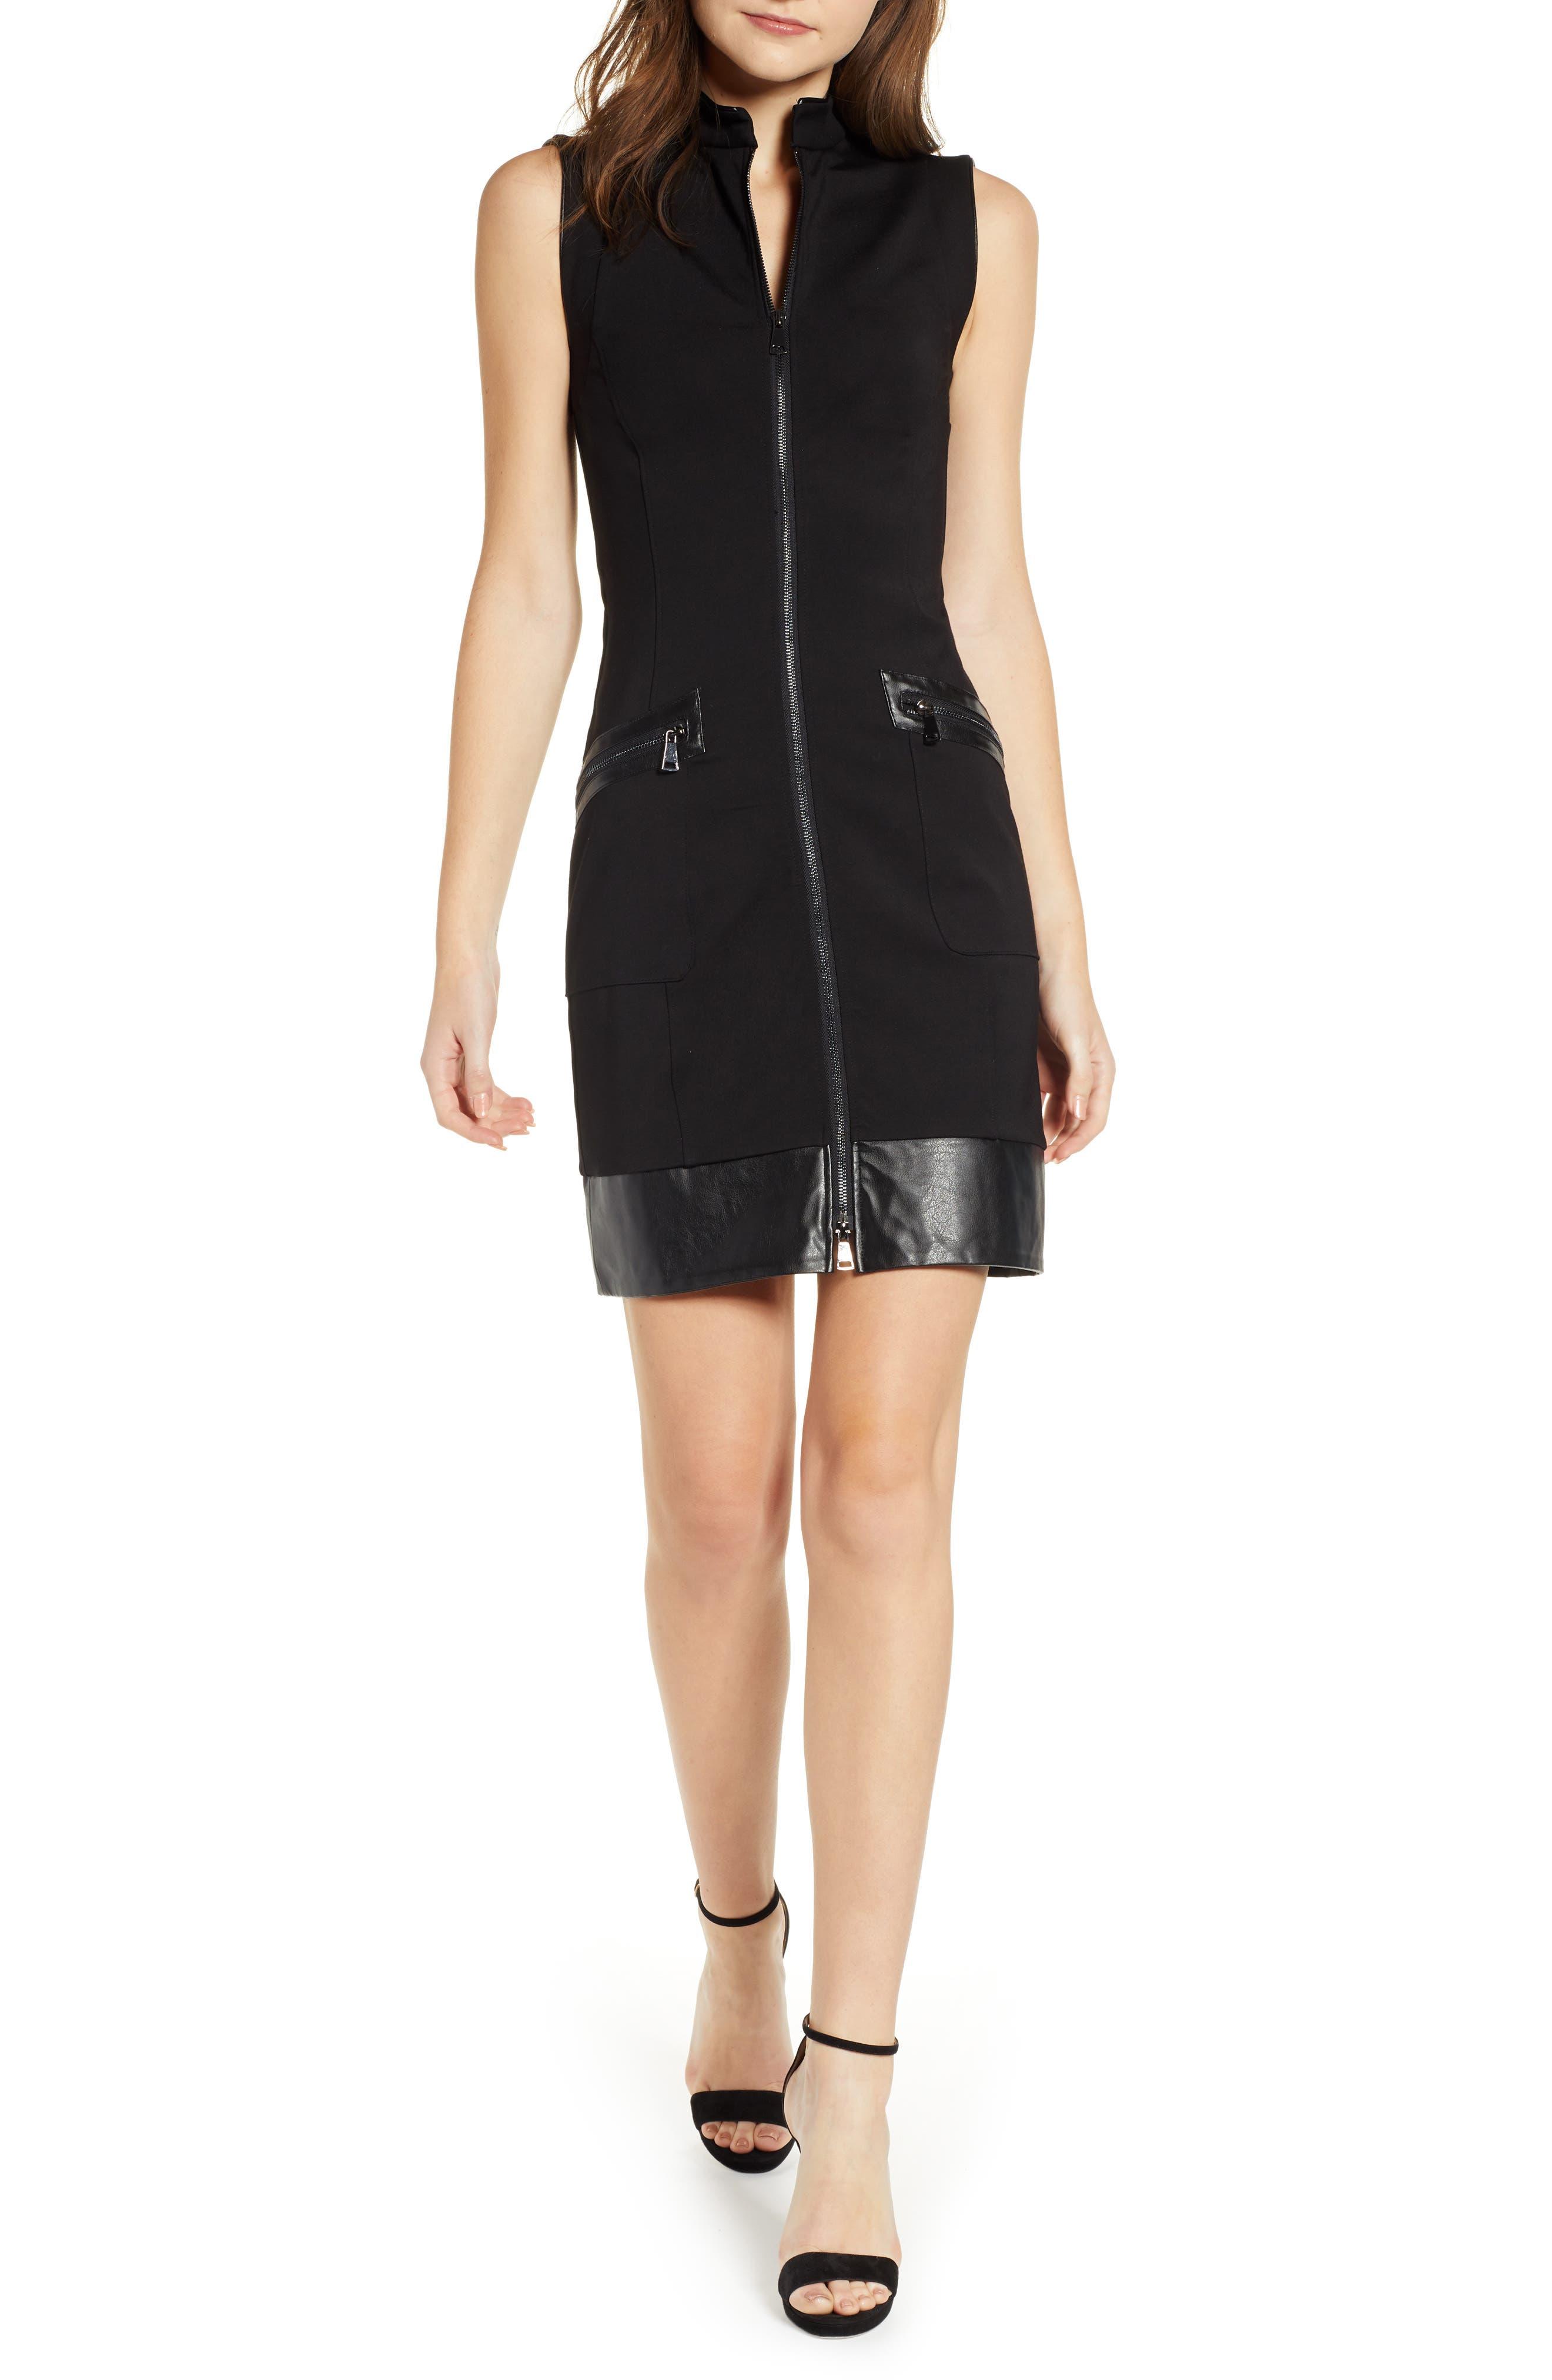 Sentimental Ny Ponte & Faux Leather Dress, Black